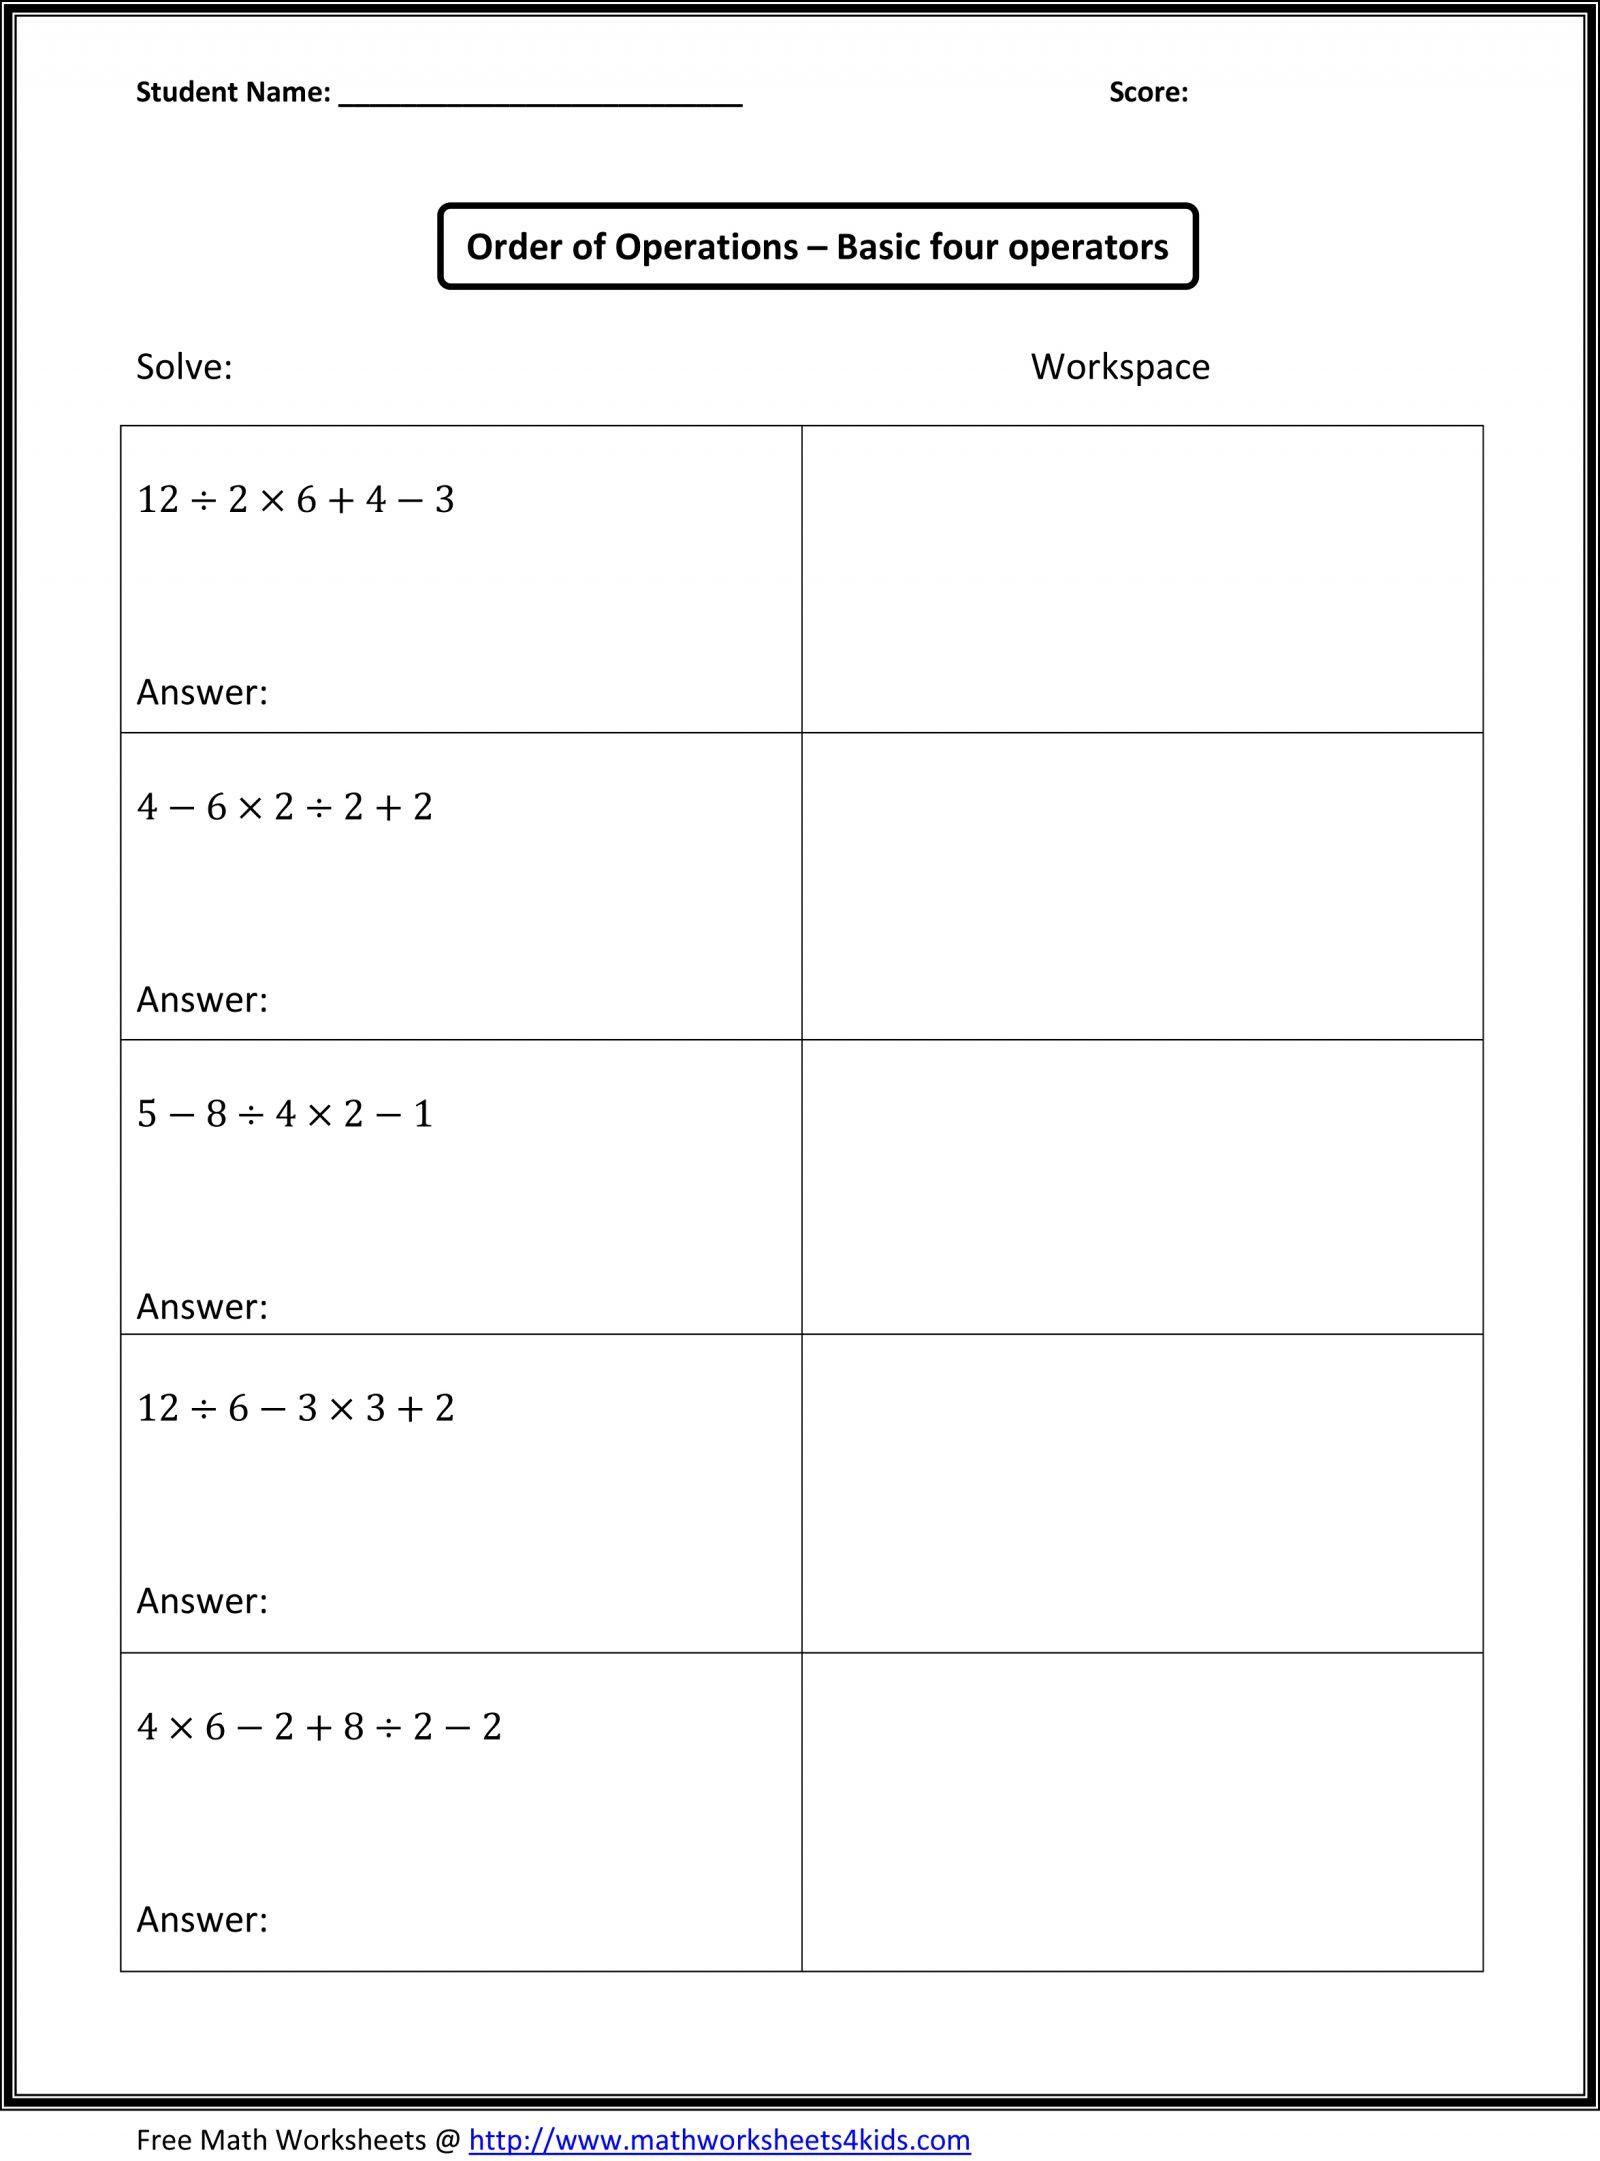 4 Free Math Worksheets Third Grade 3 Multiplication Multiplication Table 4 6 Math Worksheets Free Math Worksheets Algebra Worksheets Pemdas Worksheets